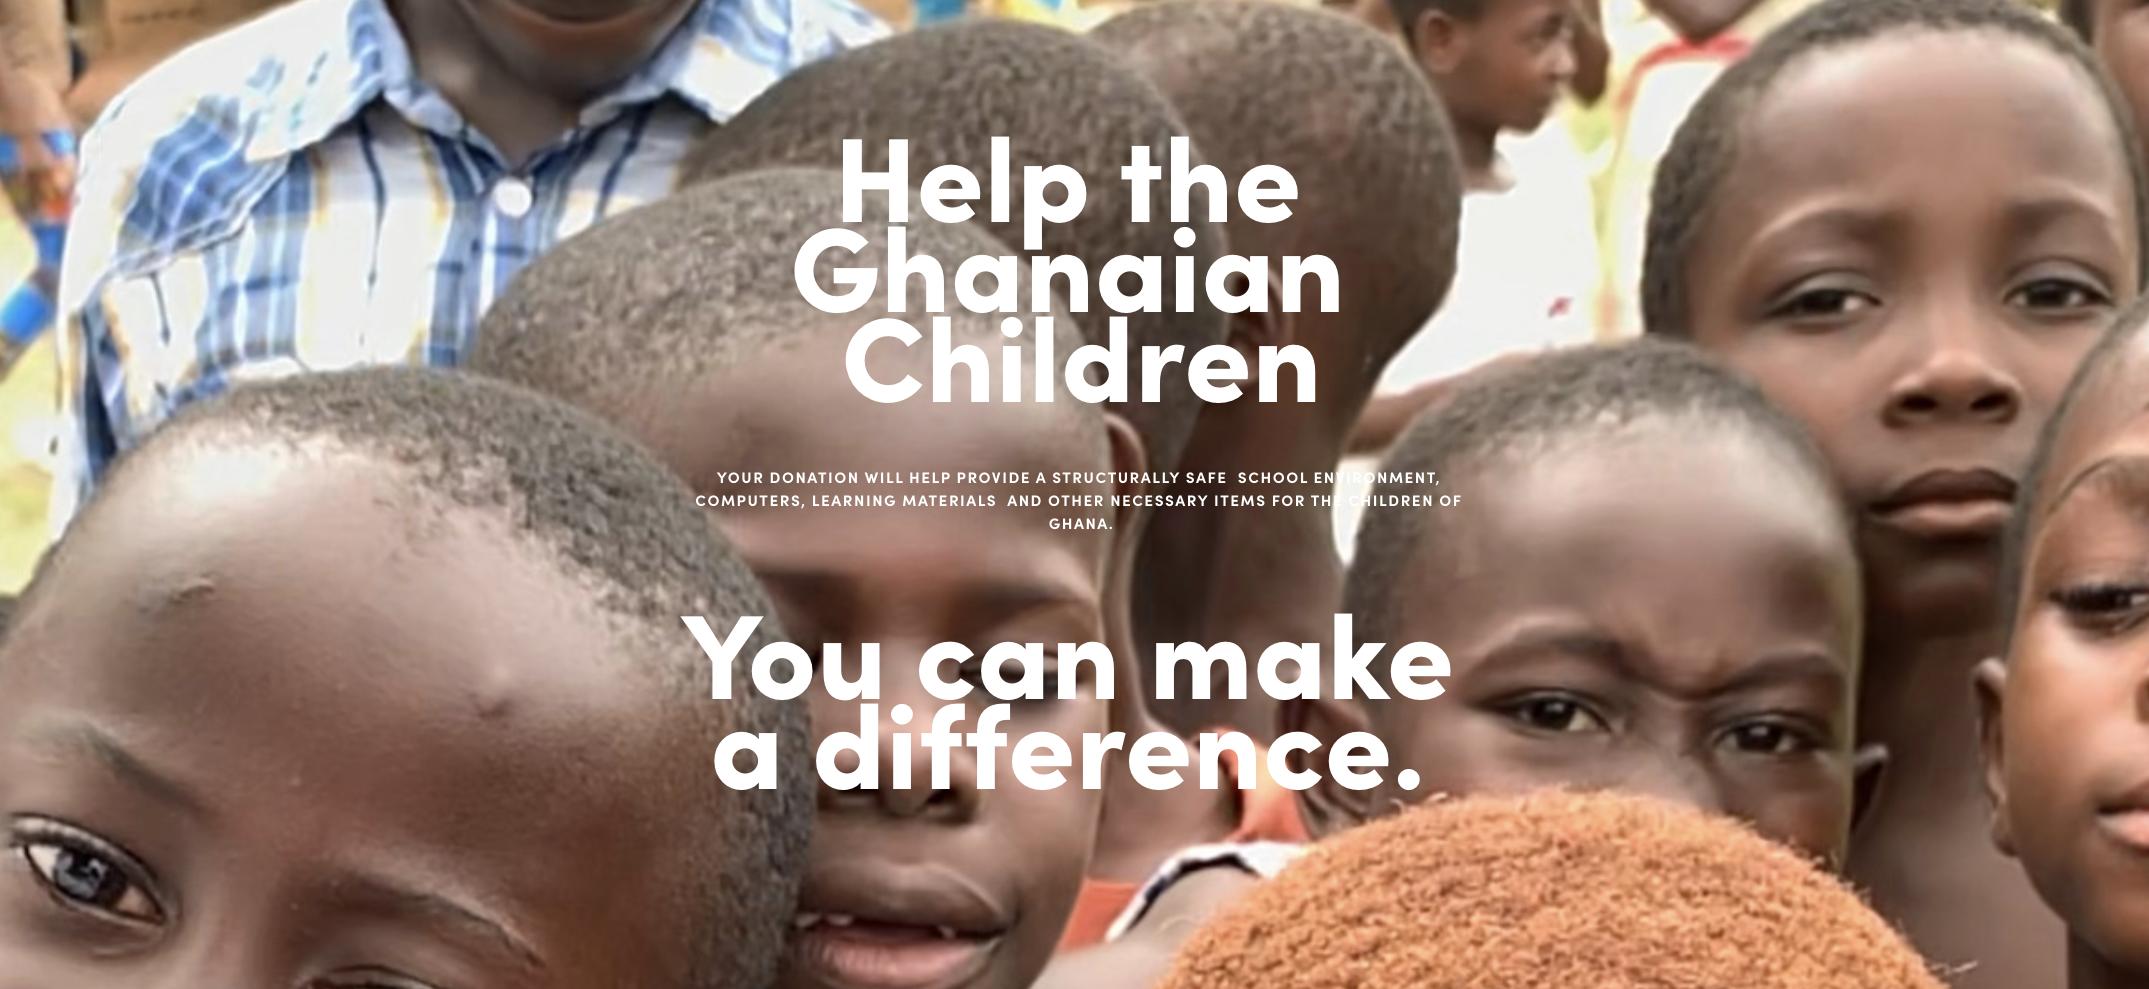 Ghanian Children.png